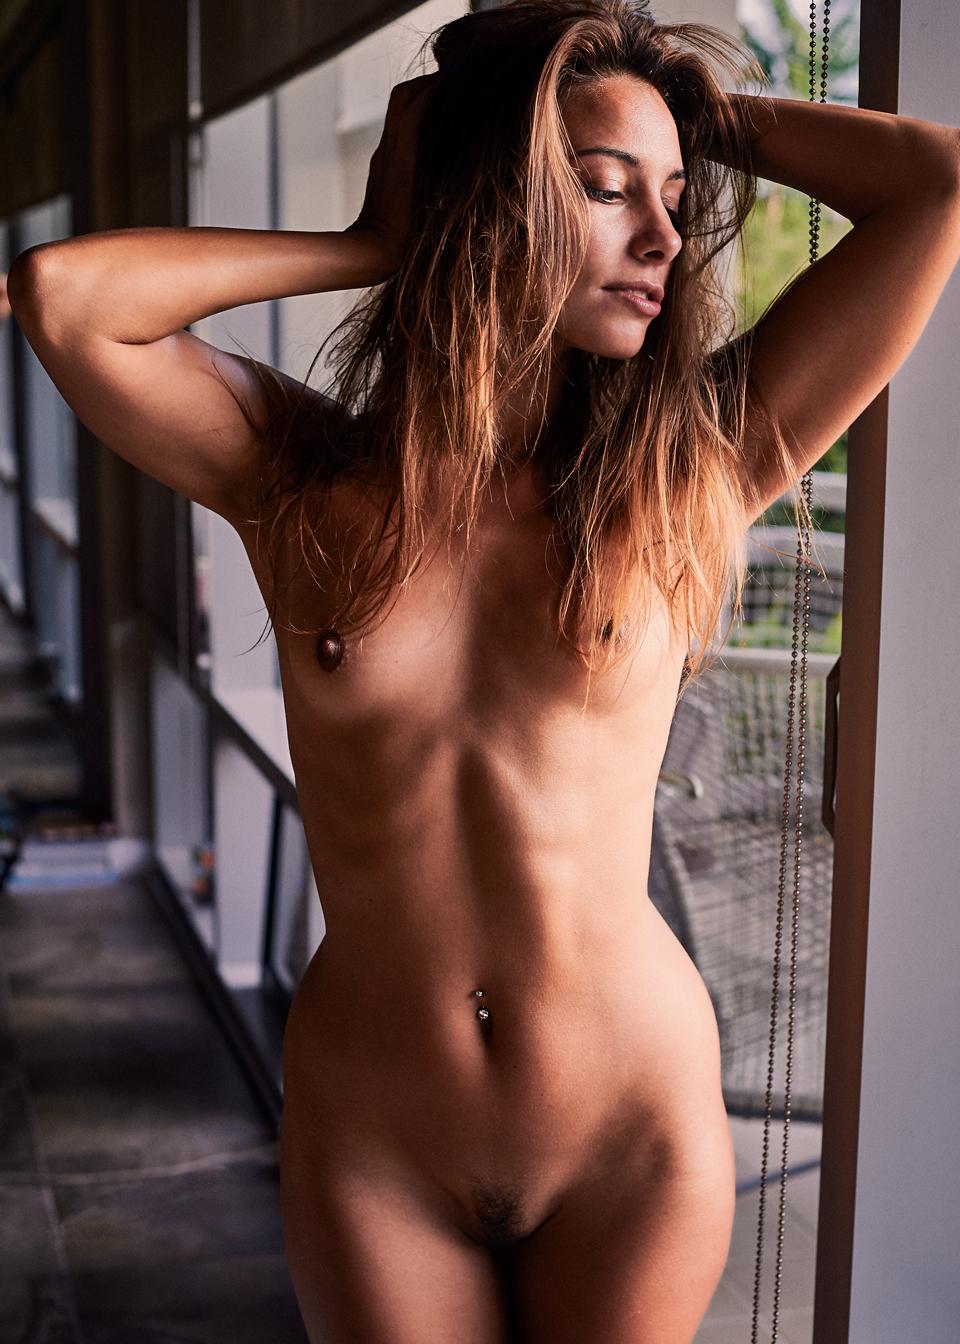 Anetta Women  photography photographer nudes nude art models model lionsmag lions magazine lingerie John Ciambrone editorial body art body art   // lionsmag.com - premium nude photography magazine